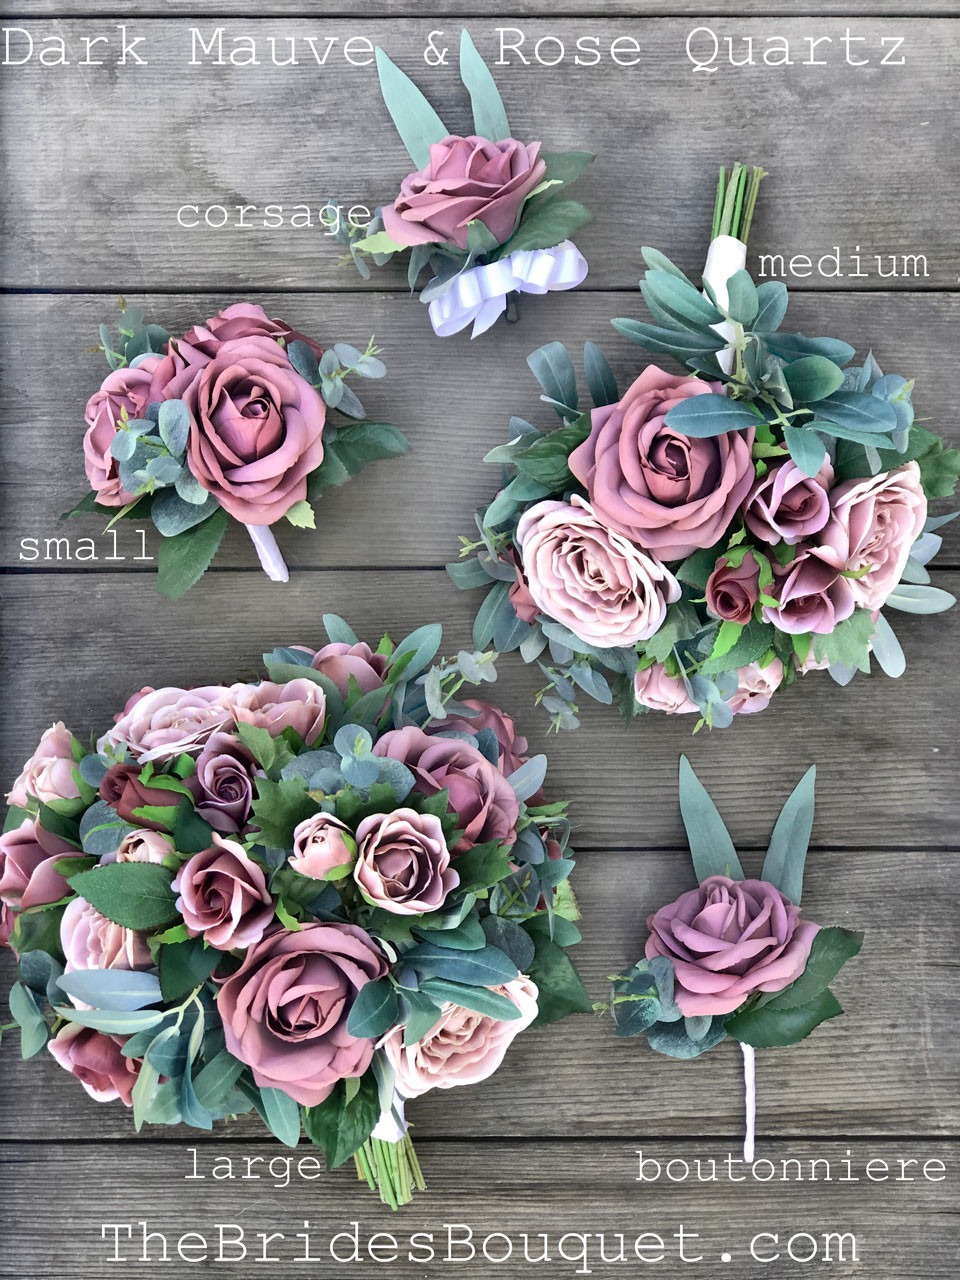 Dark Mauve Rose Silk Bridal Bouquets With Eucalyptus Greenery Small Rose Eucalyptus Thebridesbouquet Com